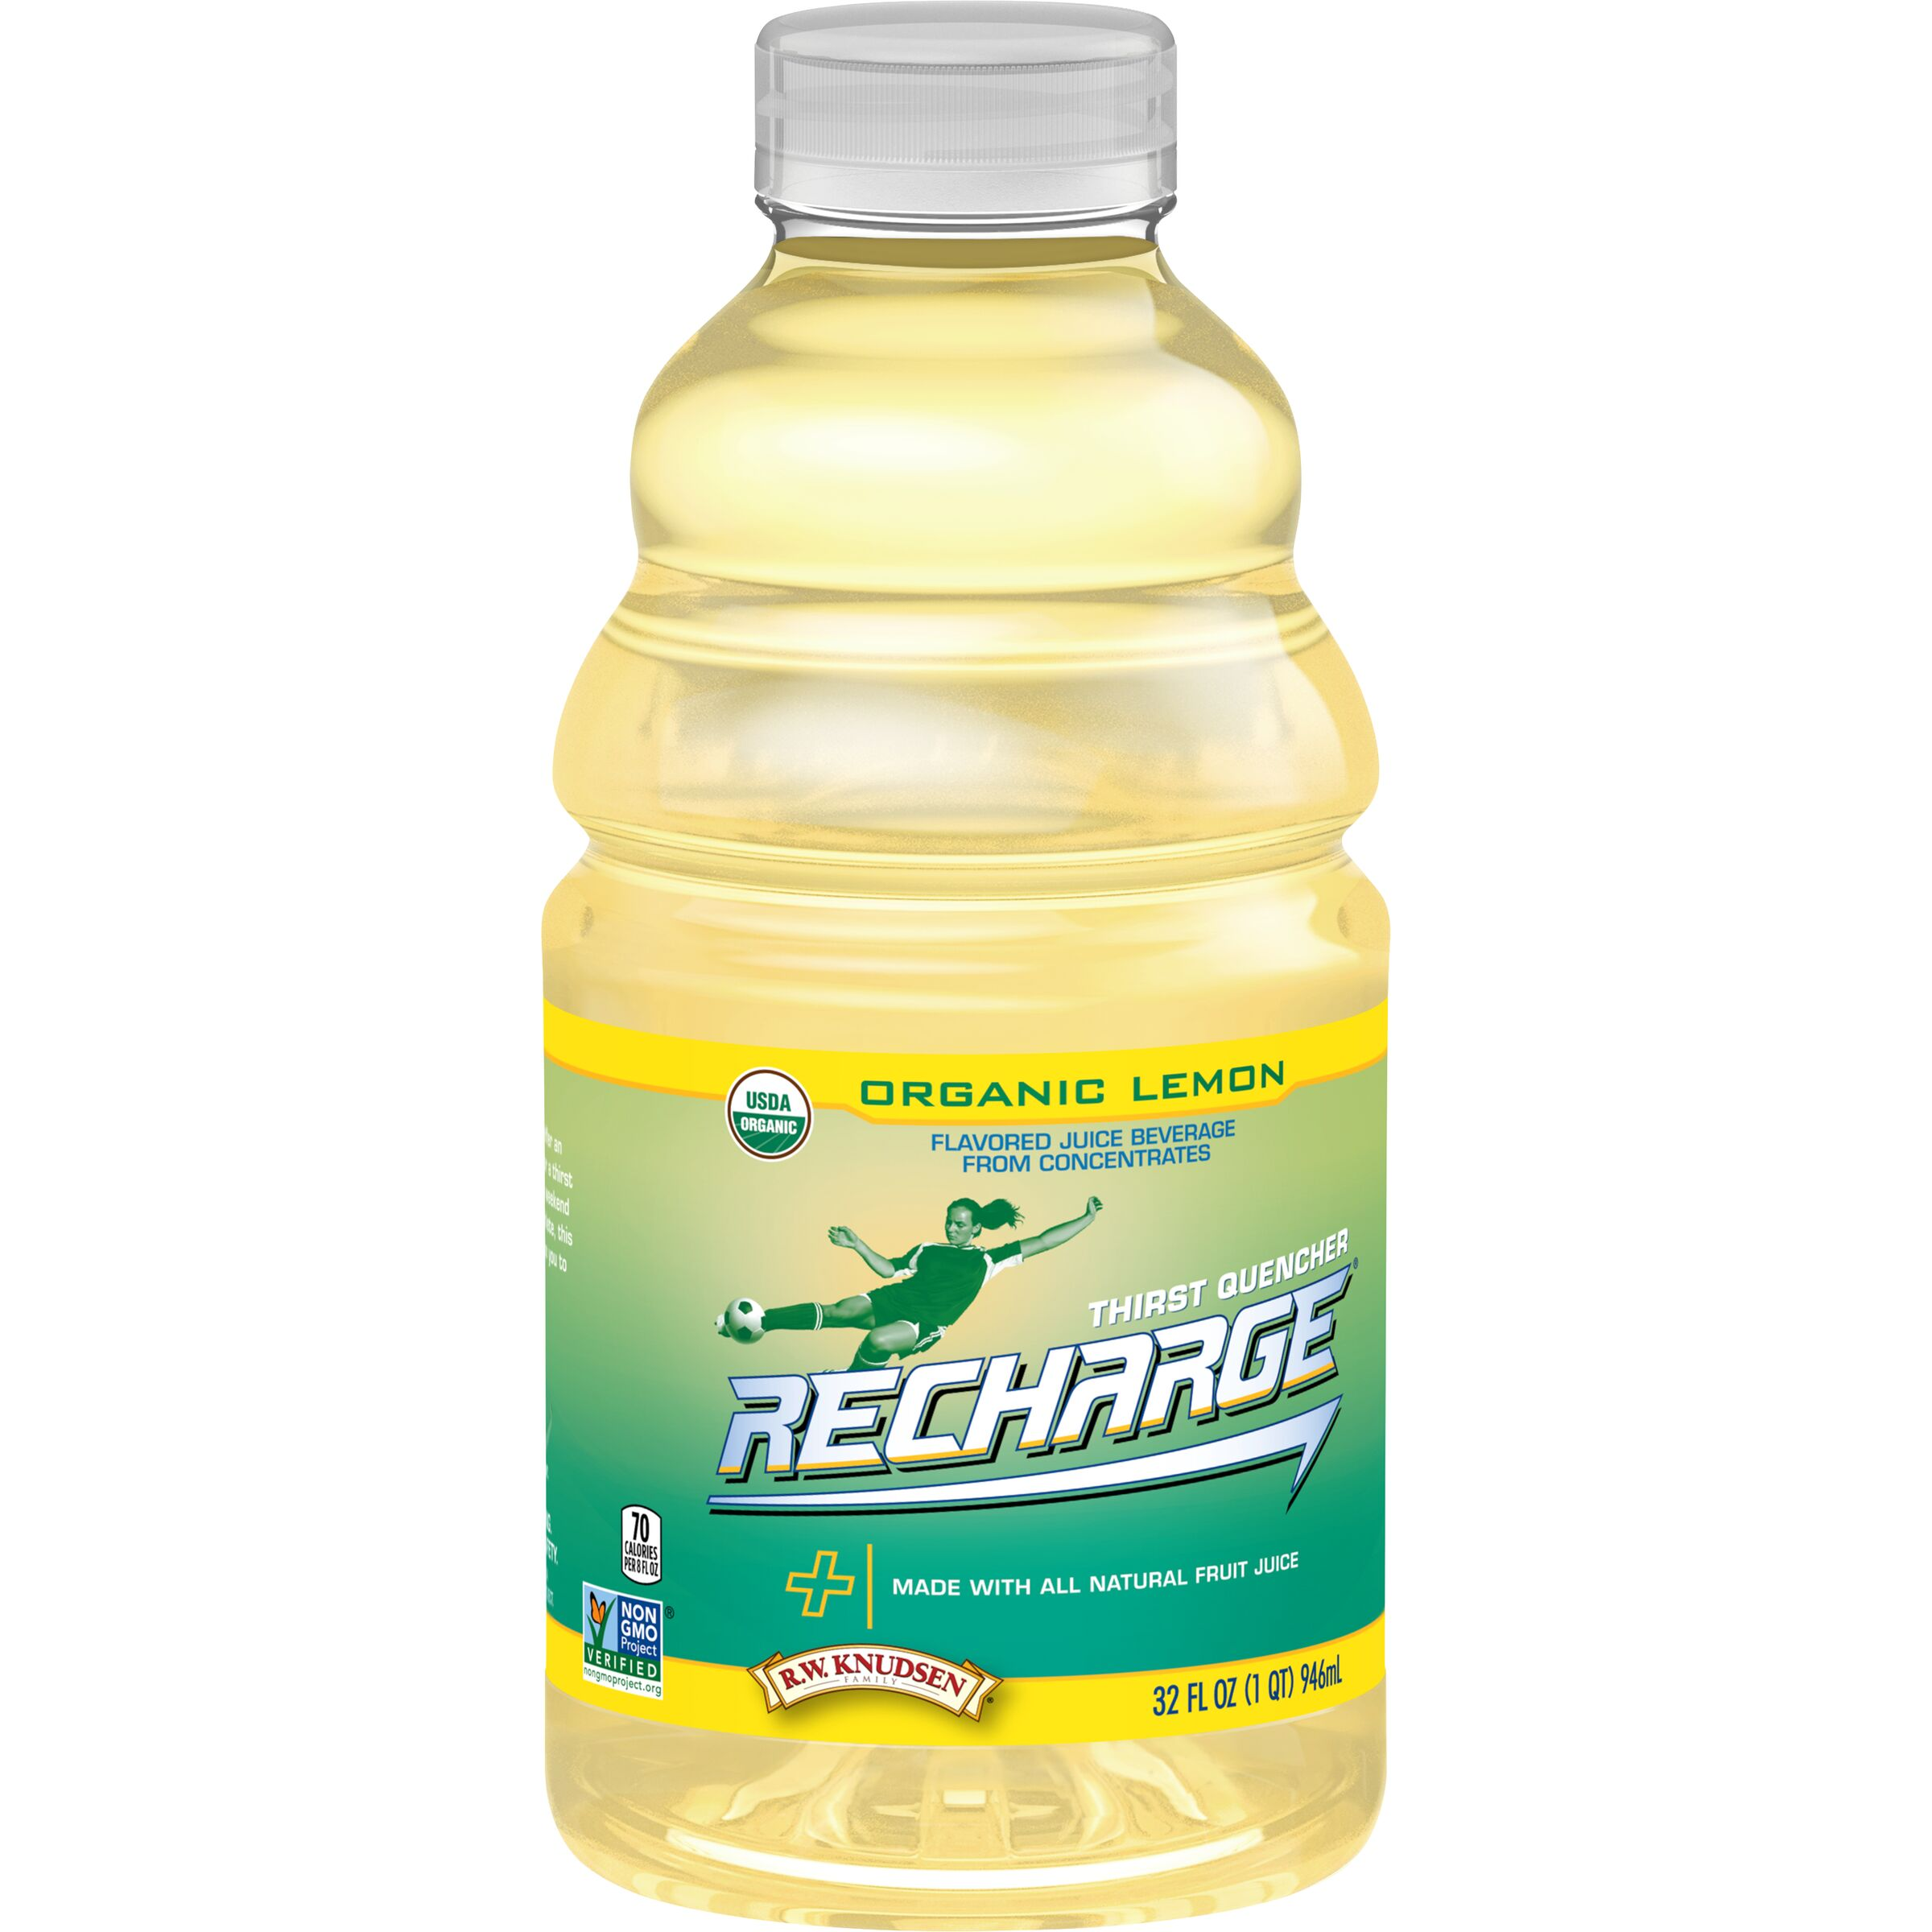 R.W. Knudsen Family Recharge Organic Lemon Sports Drink